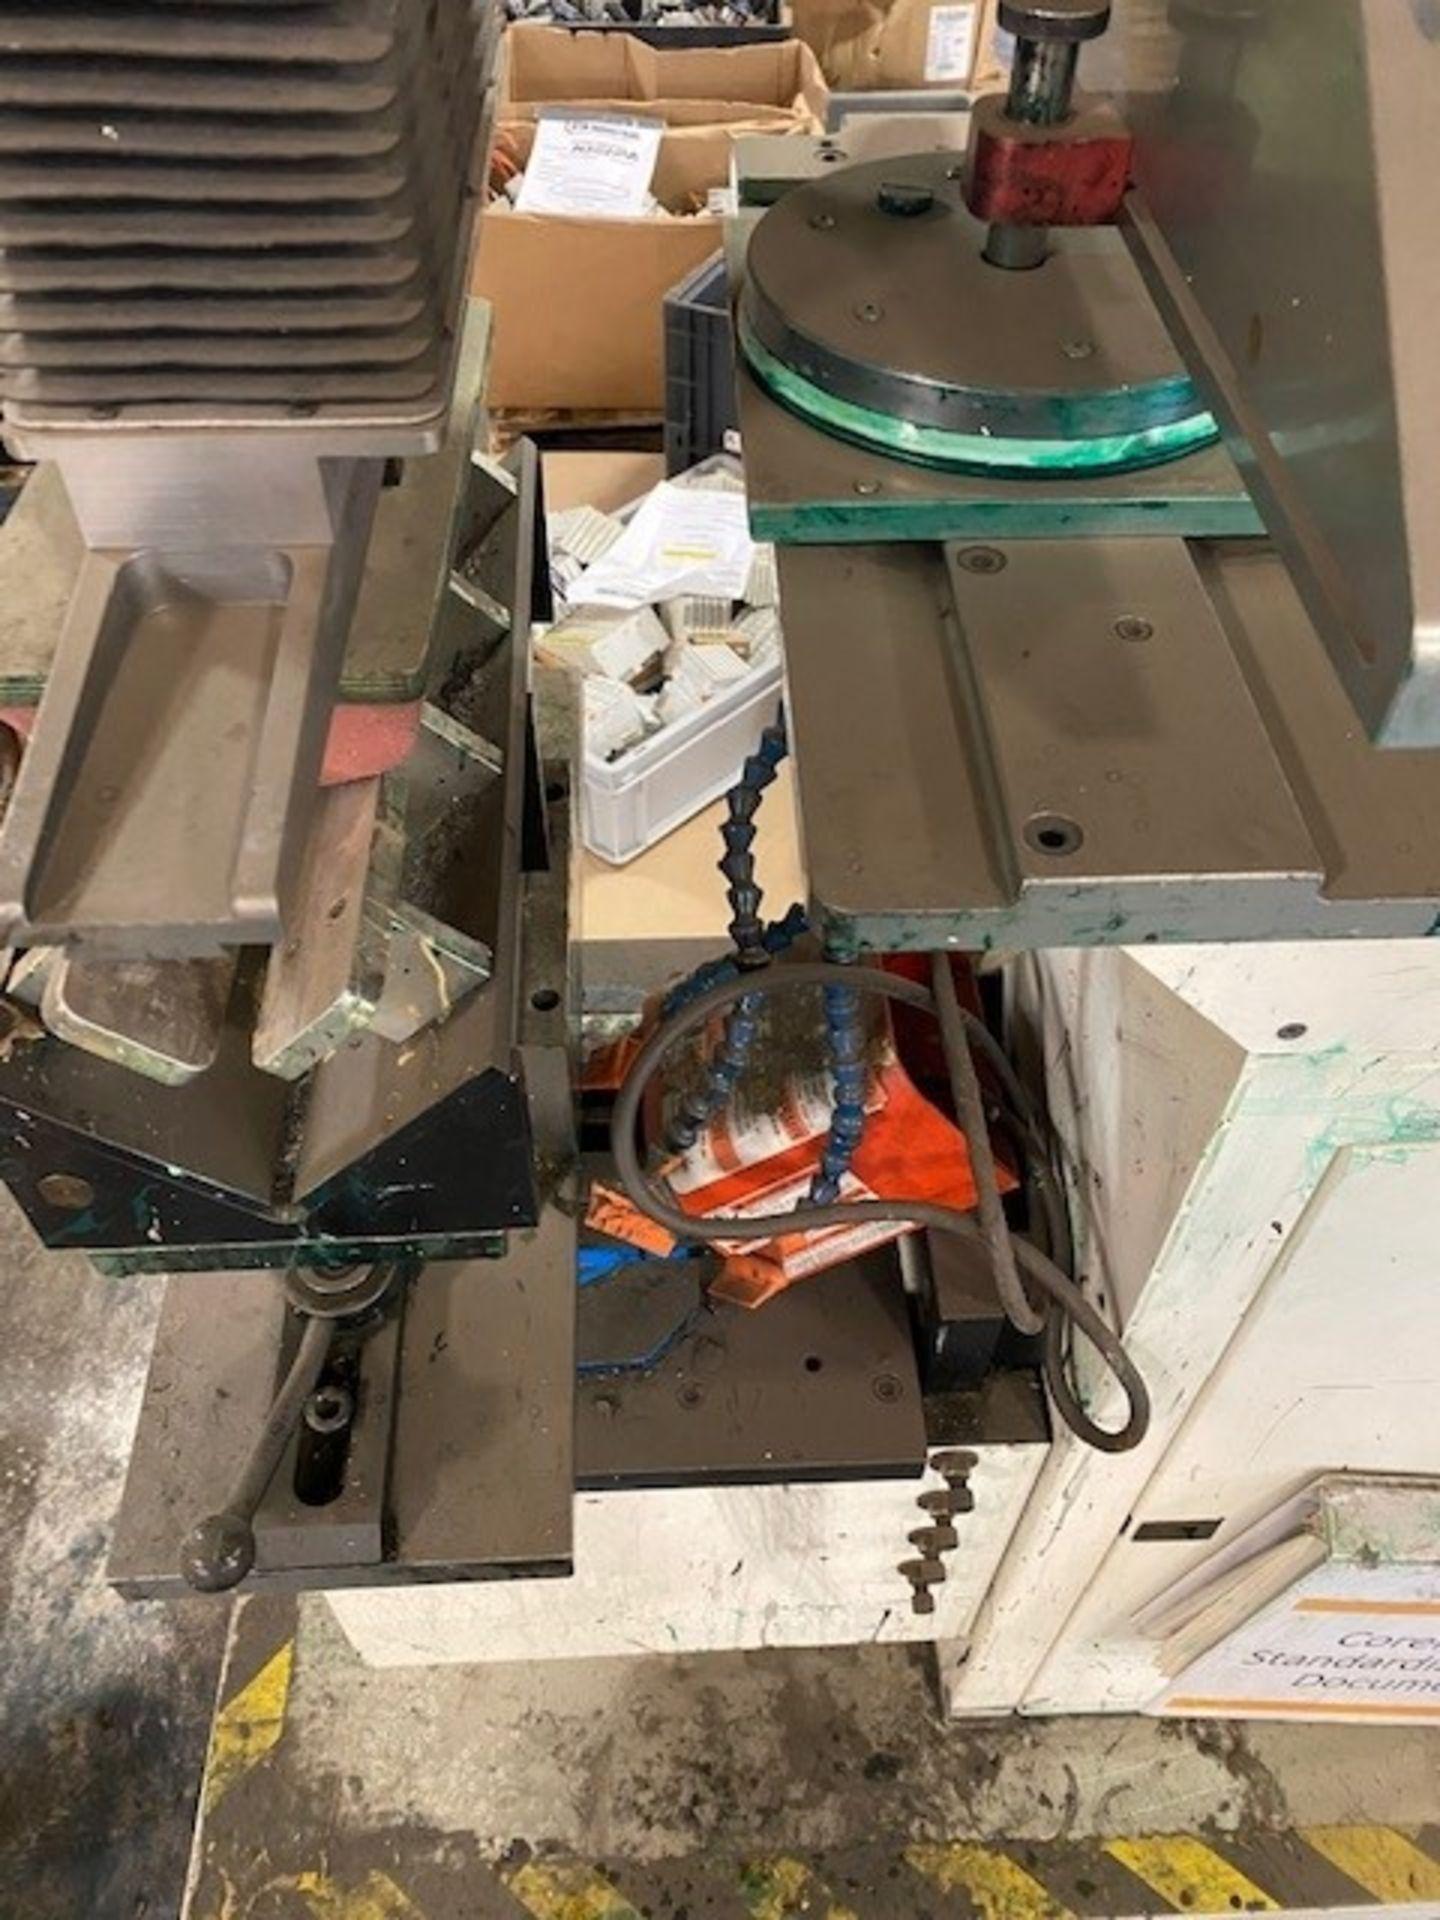 Printex G2-175 Multi-Function Modular Pad Printing Machine - Image 6 of 7